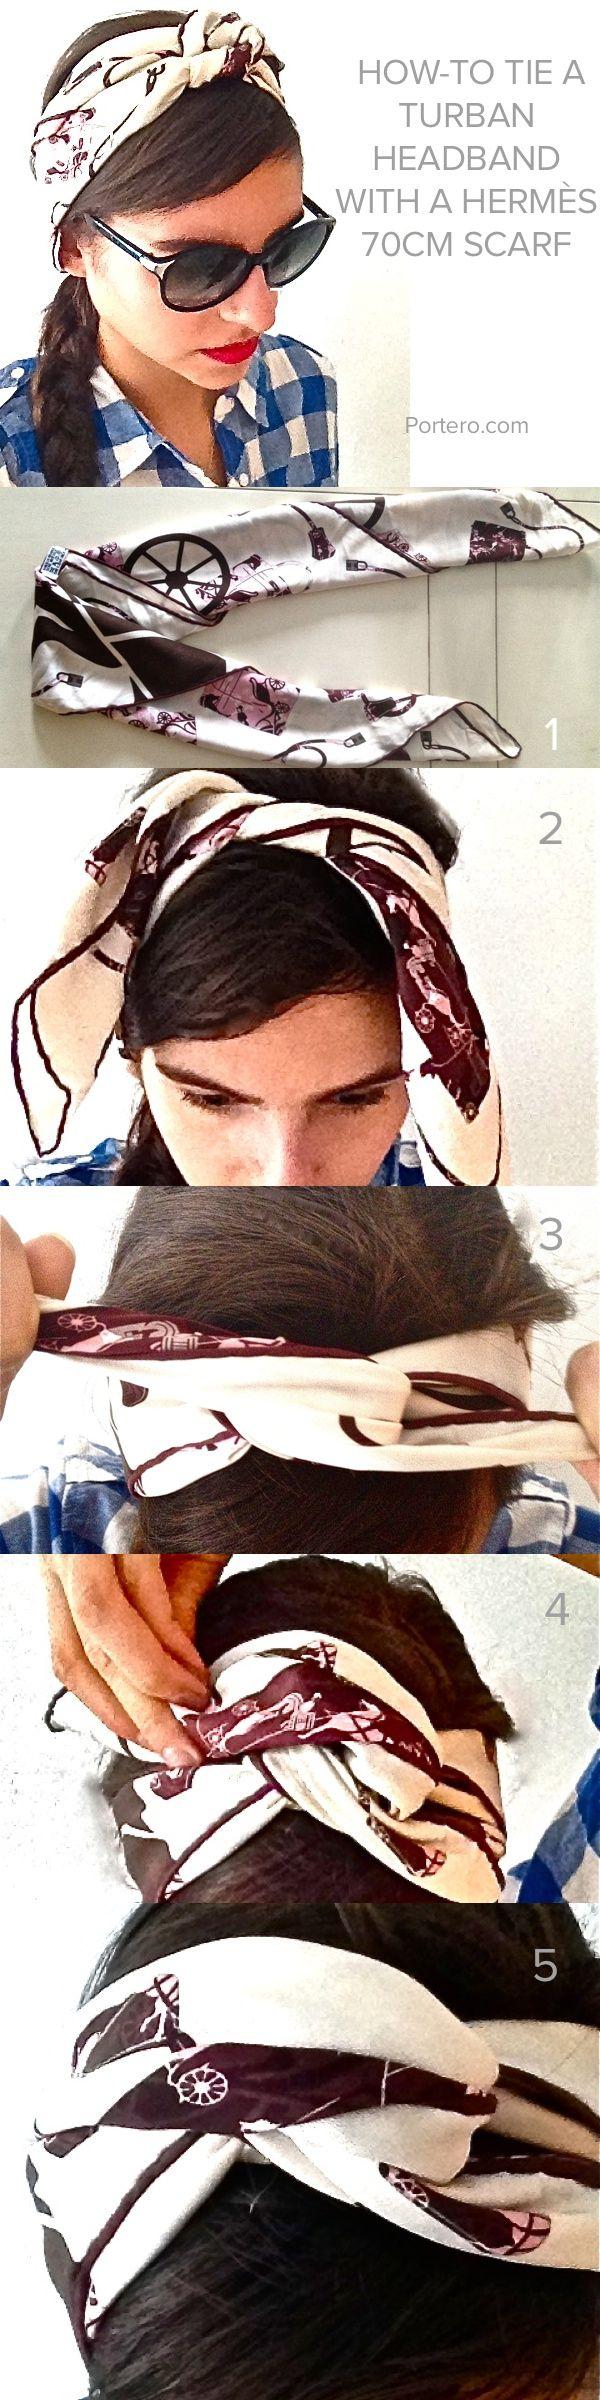 Best 25+ Tie A Bandana Ideas Only On Pinterest  How To Tie Bandana,  Bandana Headband Tutorial And Scarf Styles